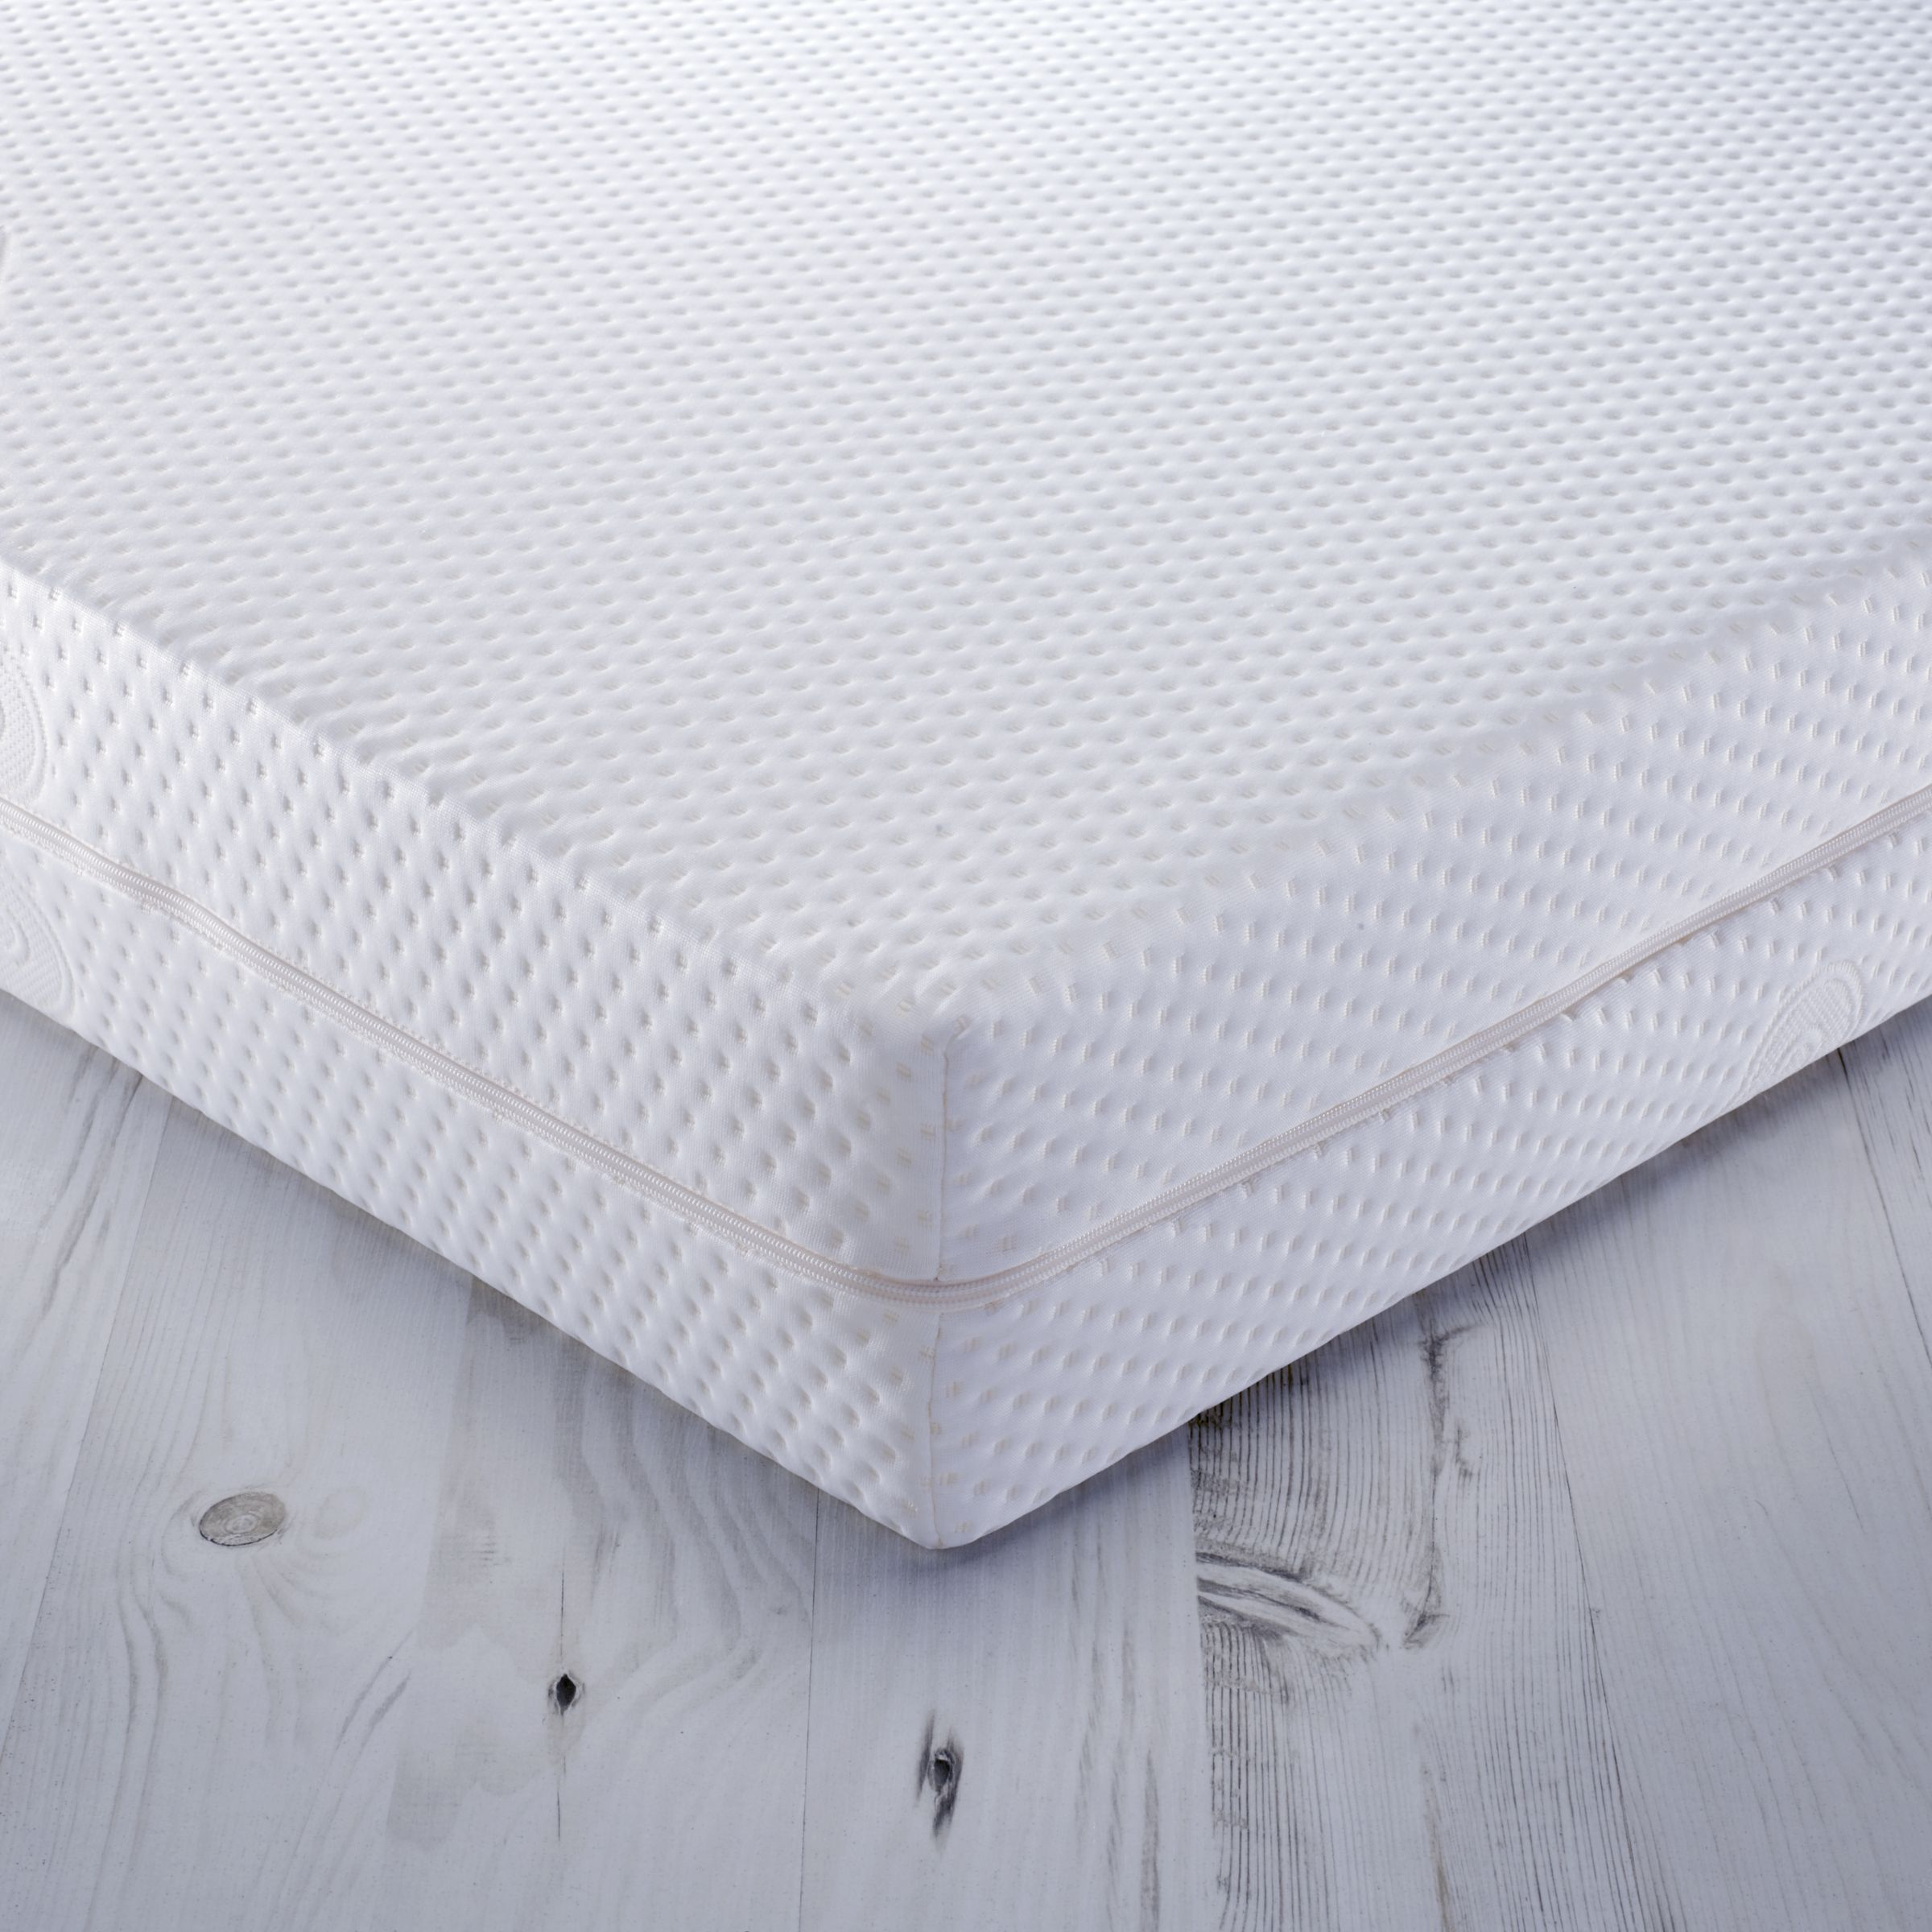 Stompa Stompa S Flex Air Flow Pocket Spring Mattress, Extra Long Single